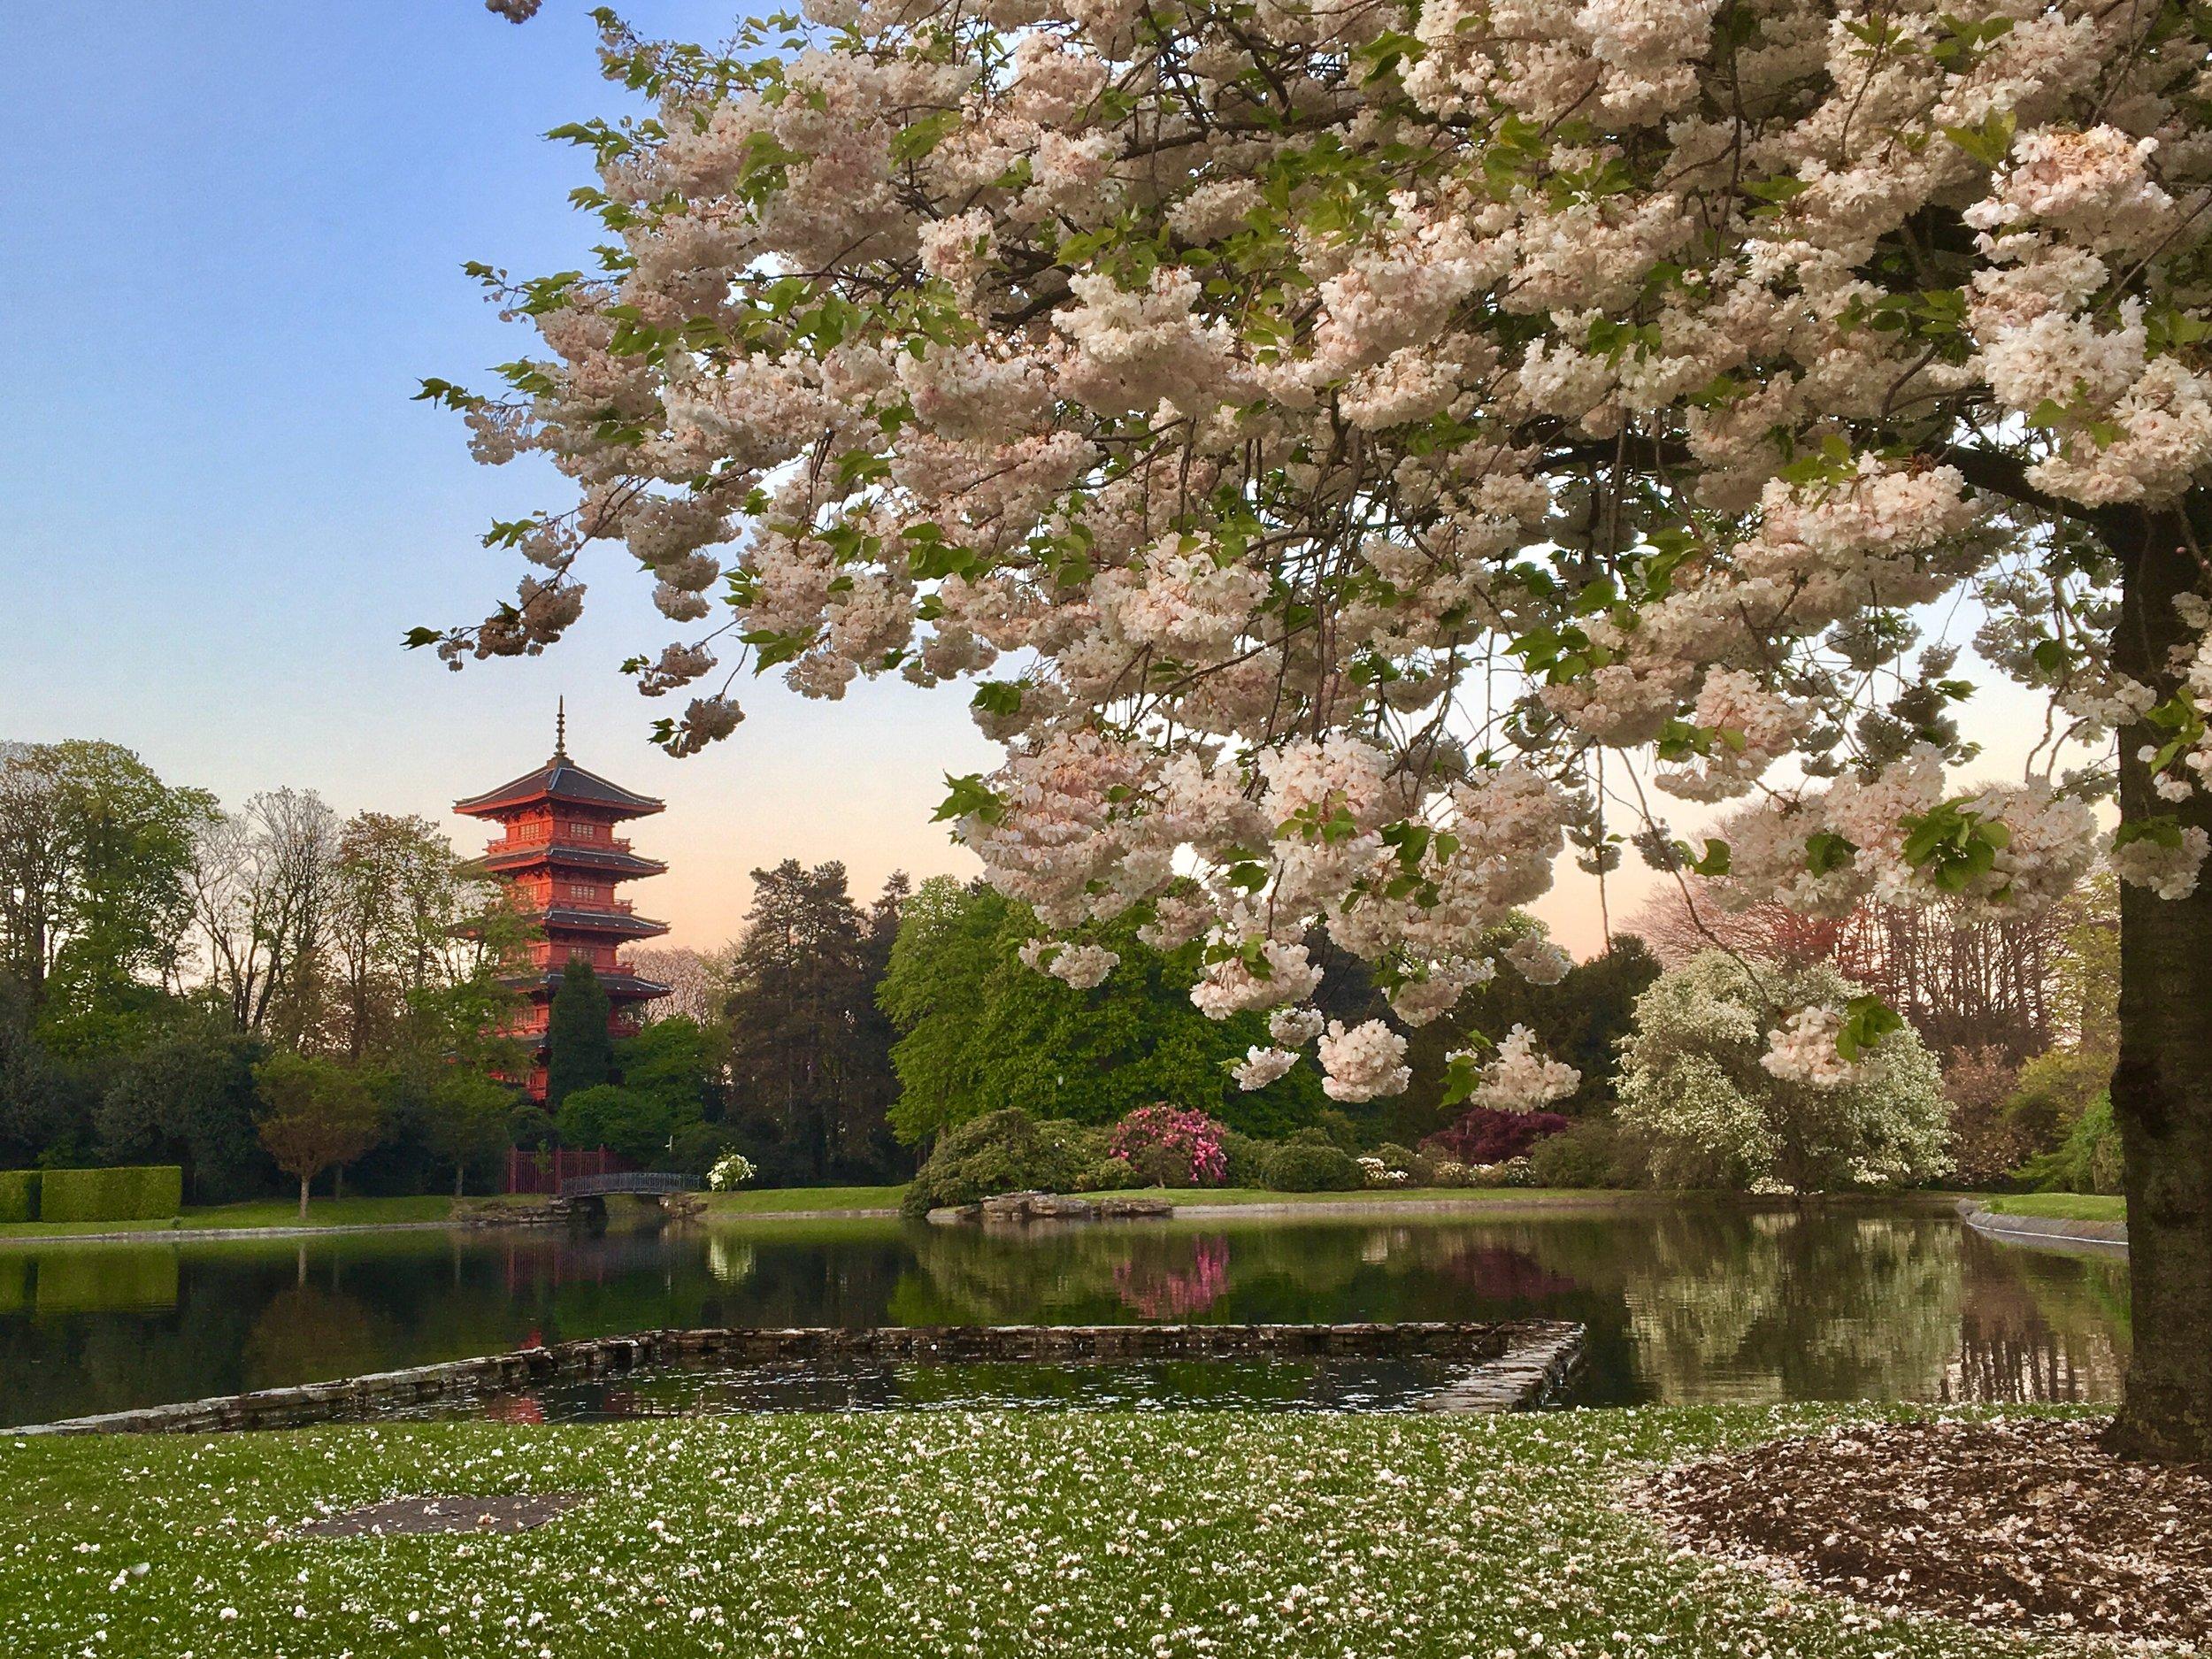 Oriental Gardens in Laeken Palace